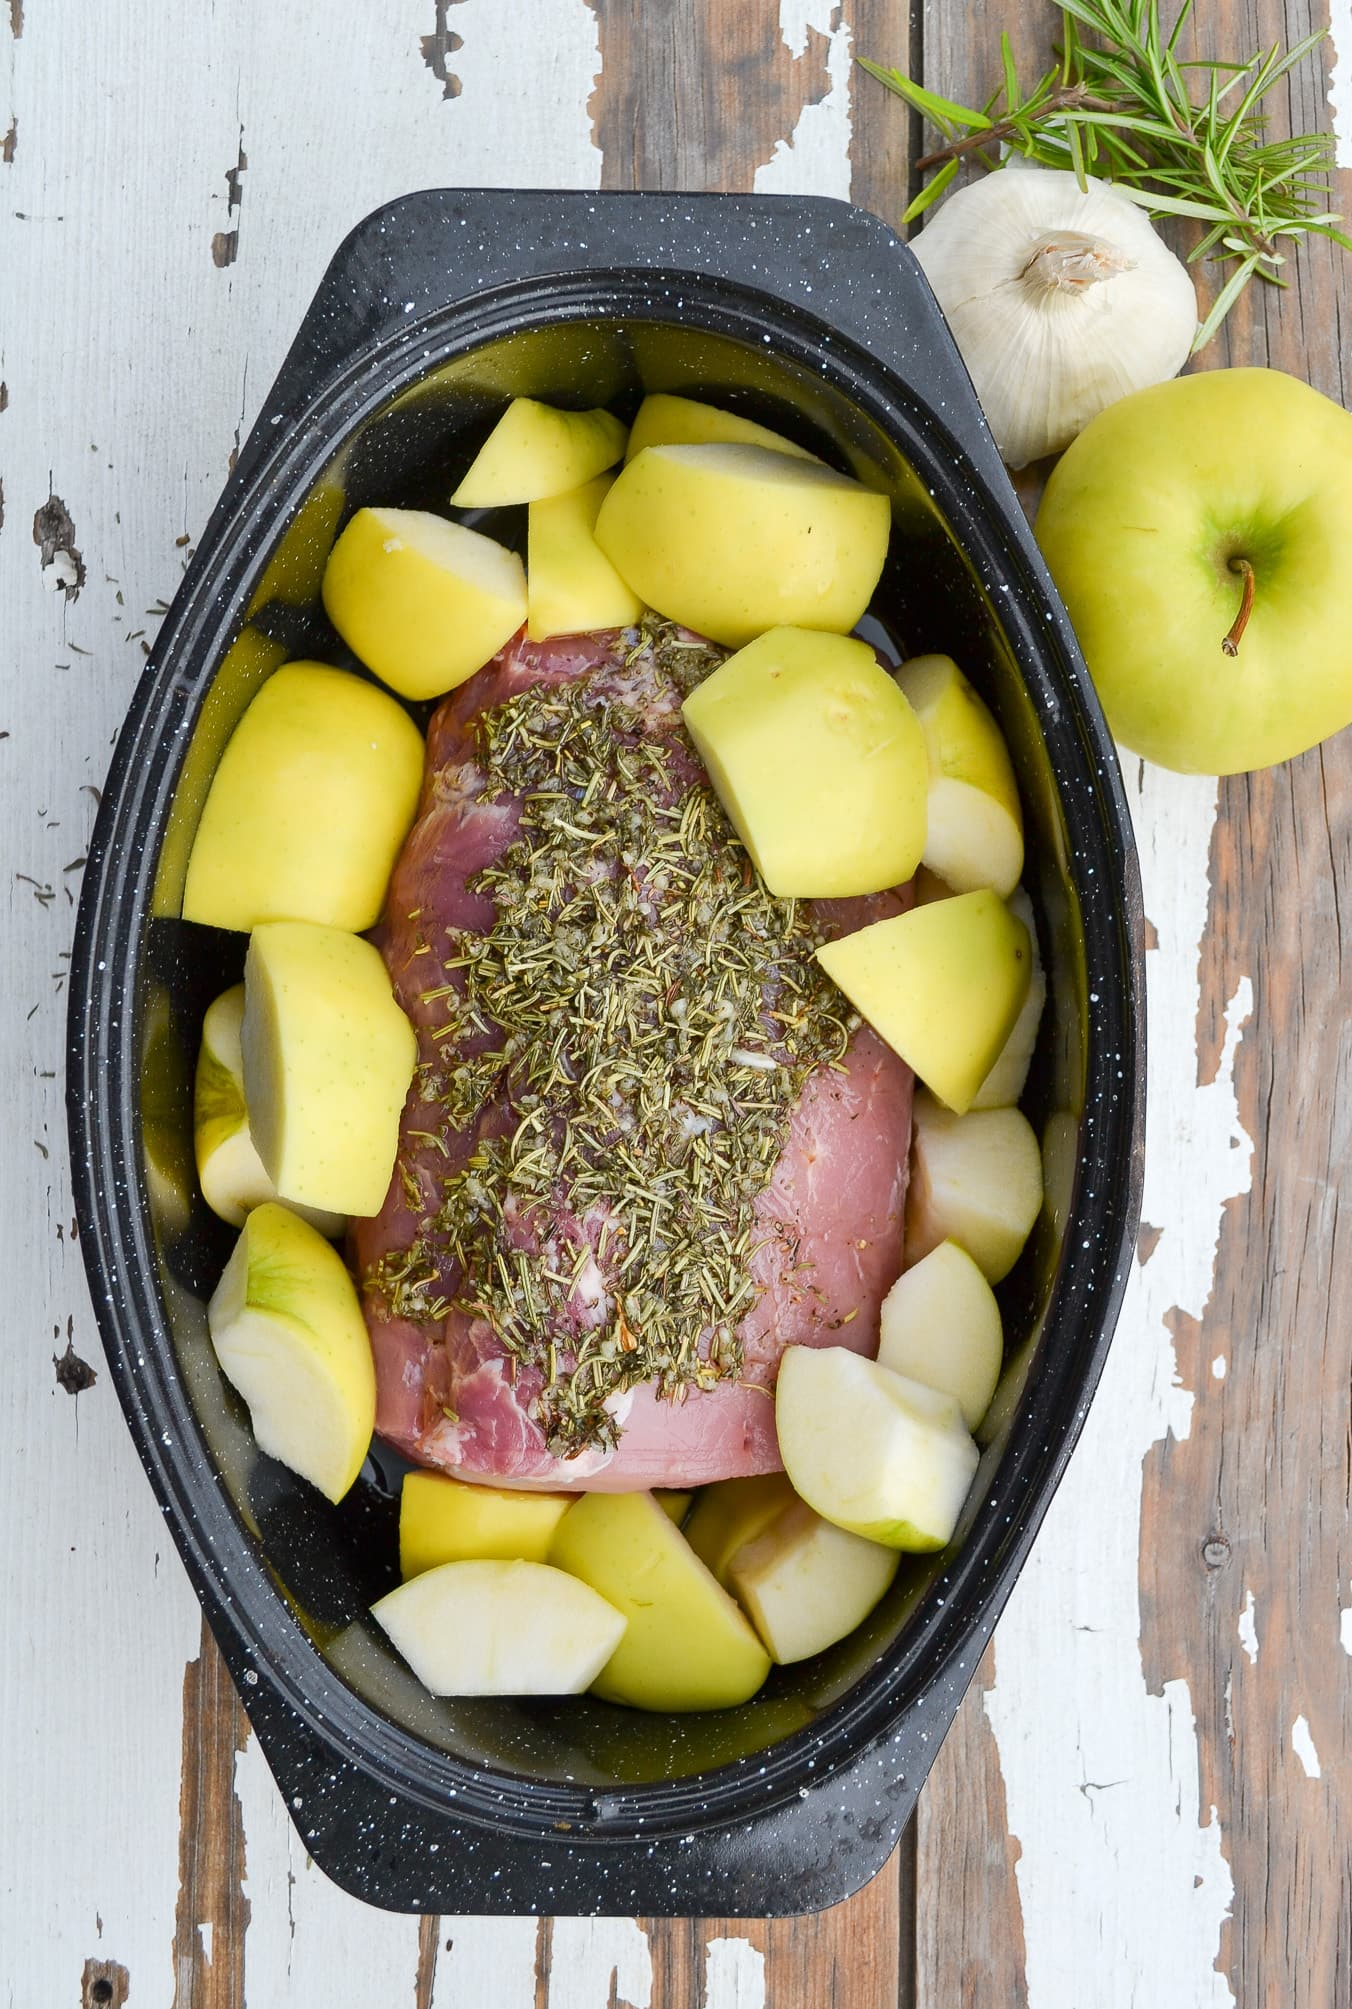 Garlic & Rosemary Roasted Pork